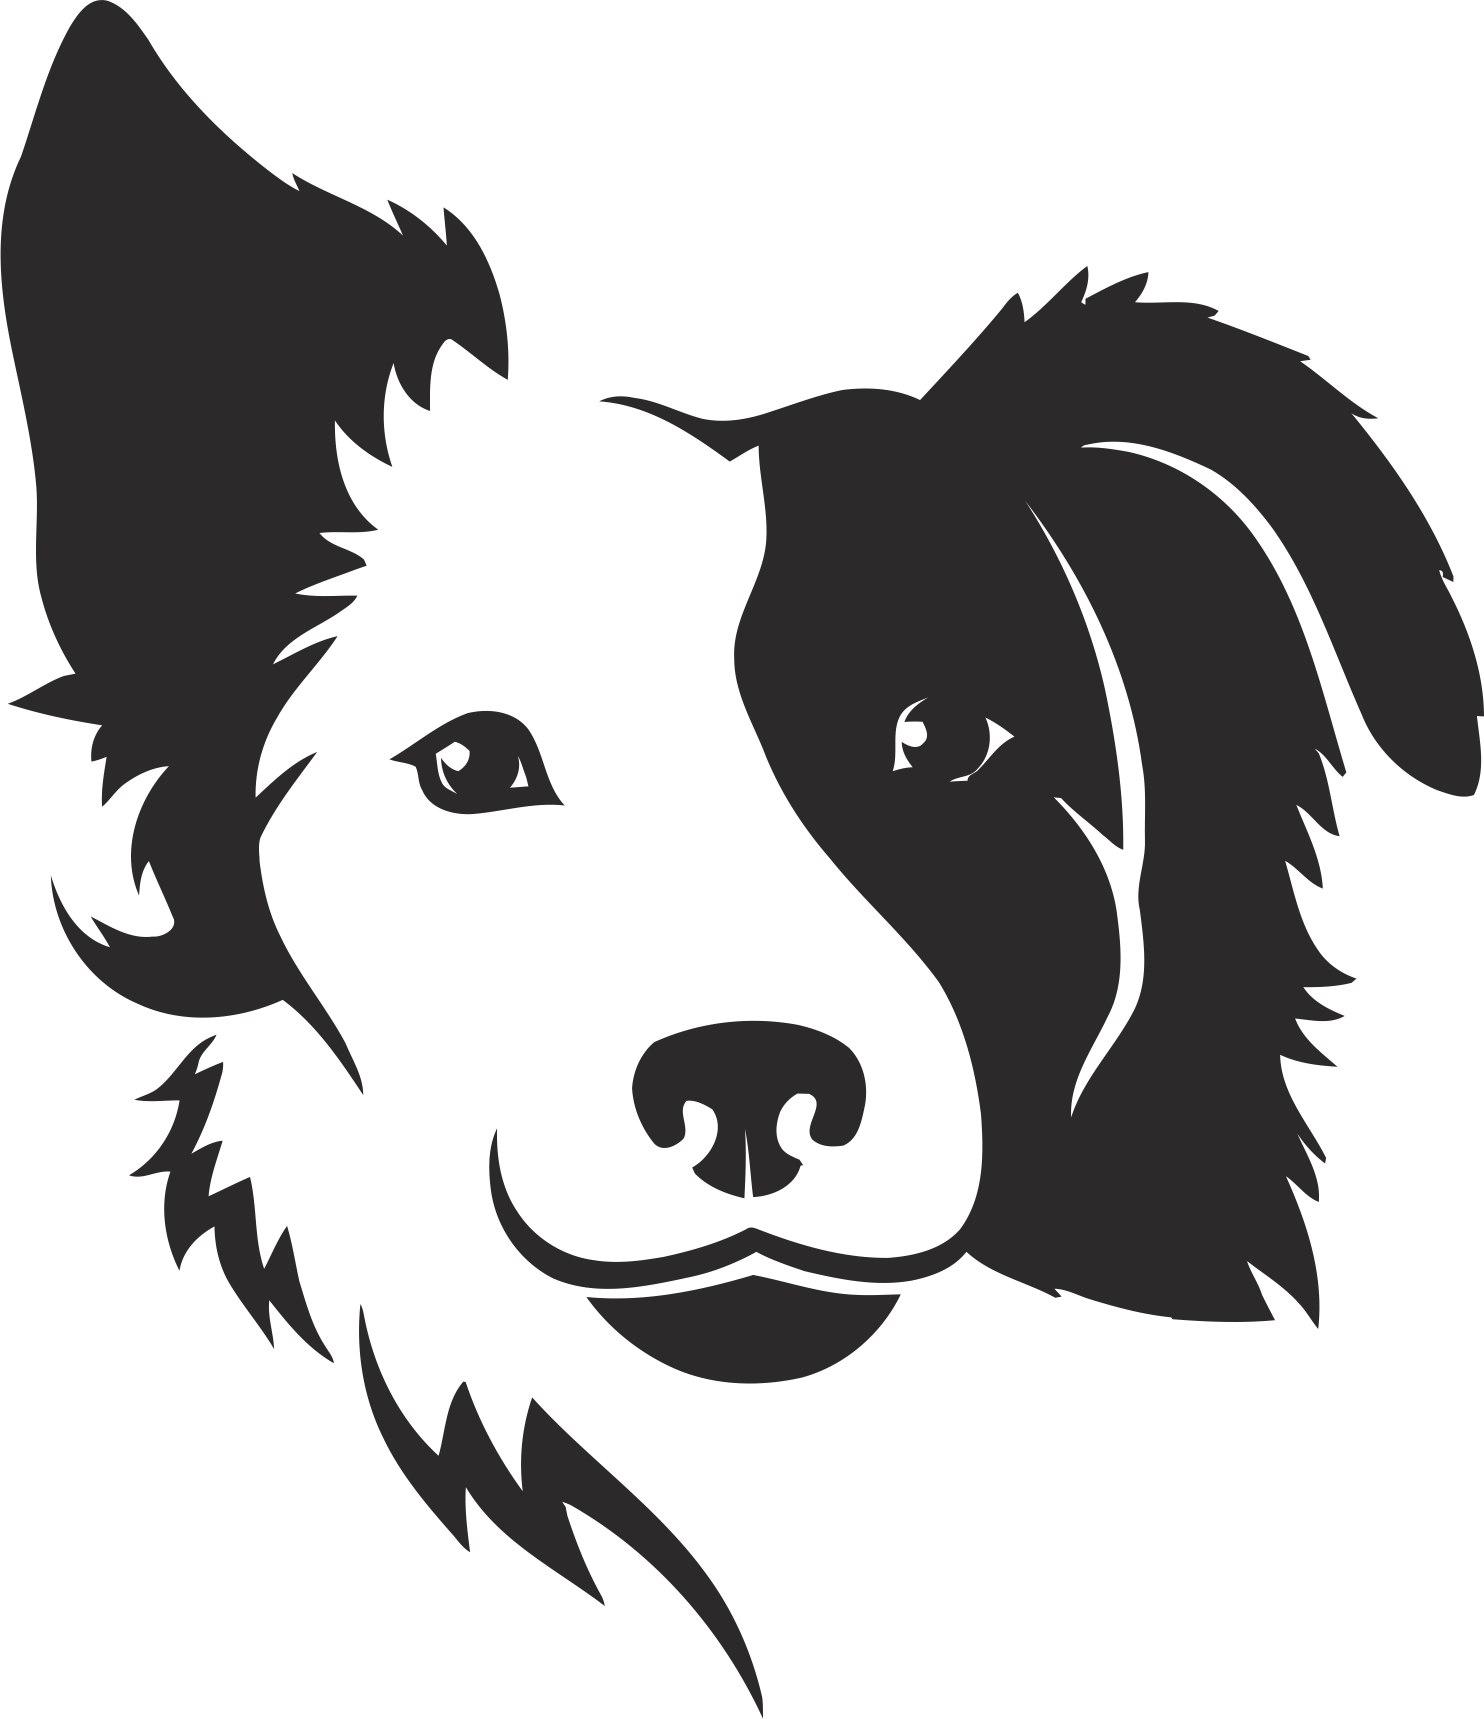 Dog Silhouette Free CDR Vectors Art